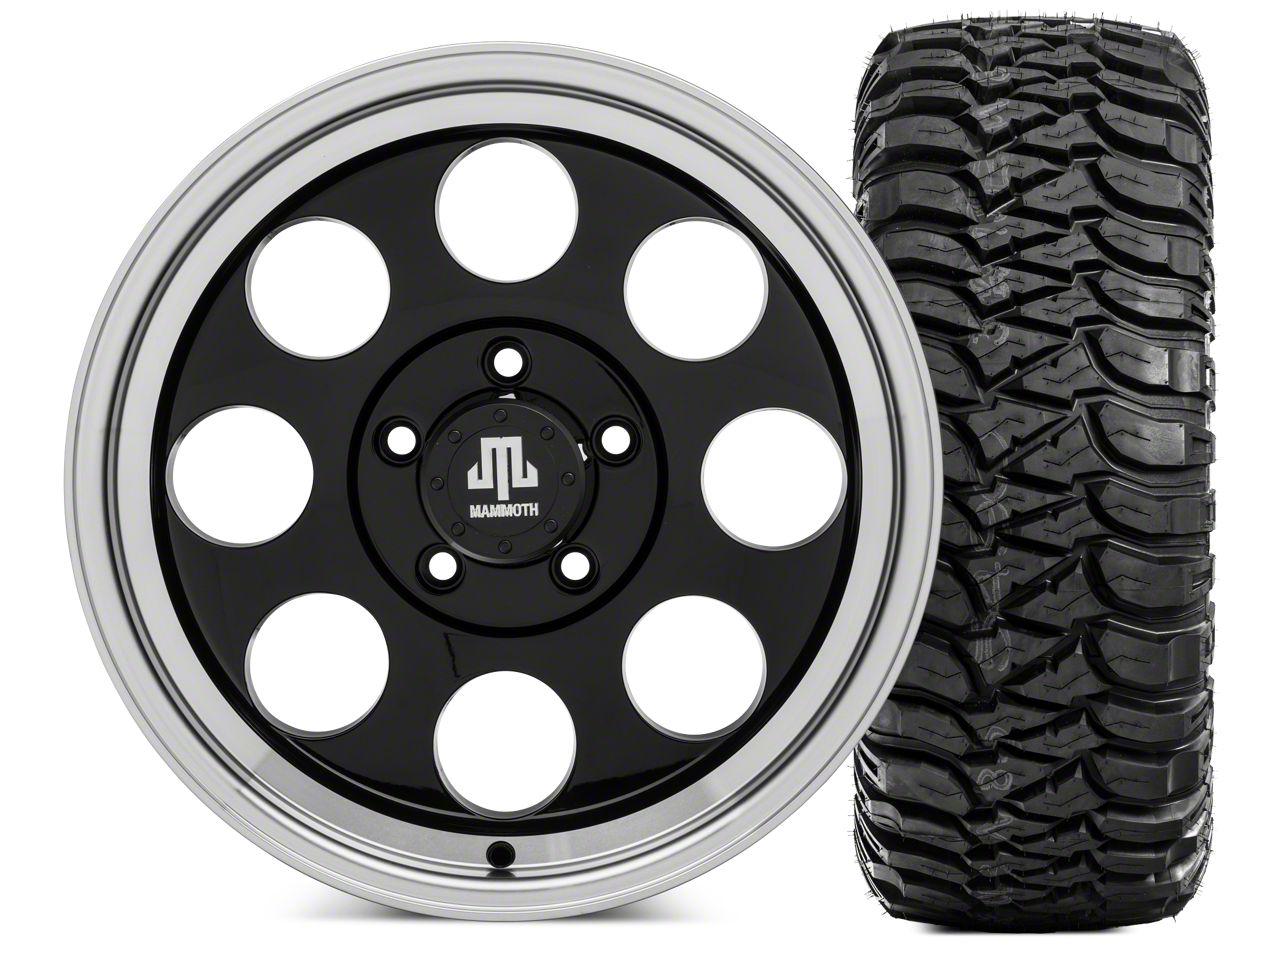 Mammoth 8 Wheel - 17x9 Wheel and Mickey Thompson Baja MTZ 305/70- 17 Tire Kit (07-18 Jeep Wrangler JK)